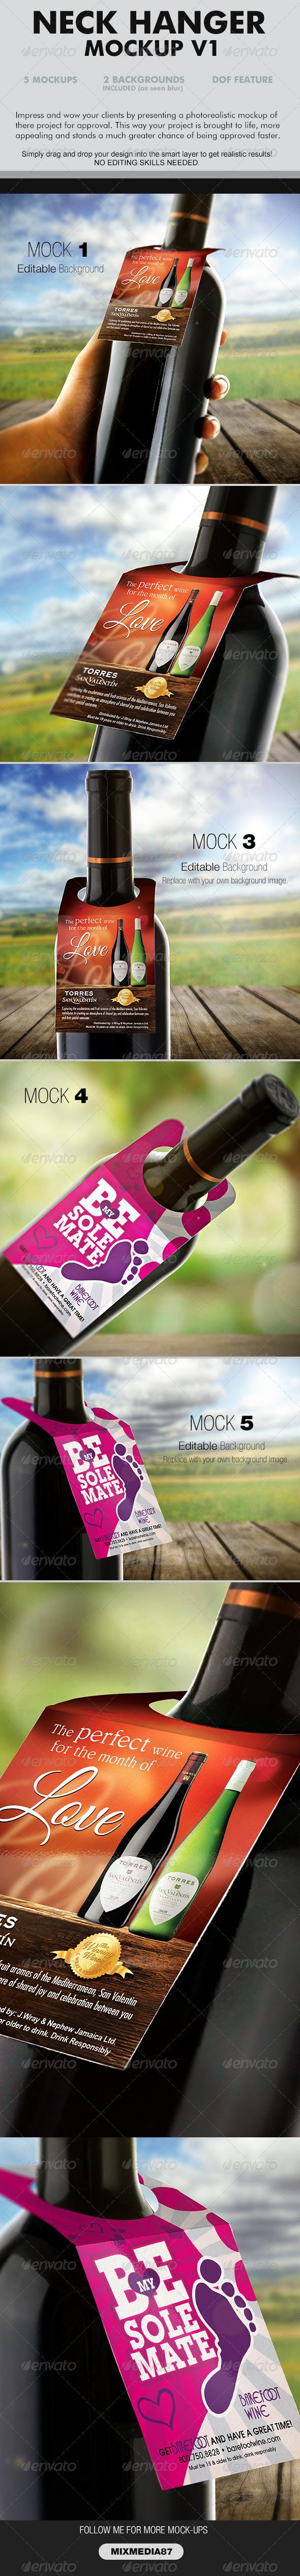 GraphicRiver Wine Neckhanger Mockup 6879990